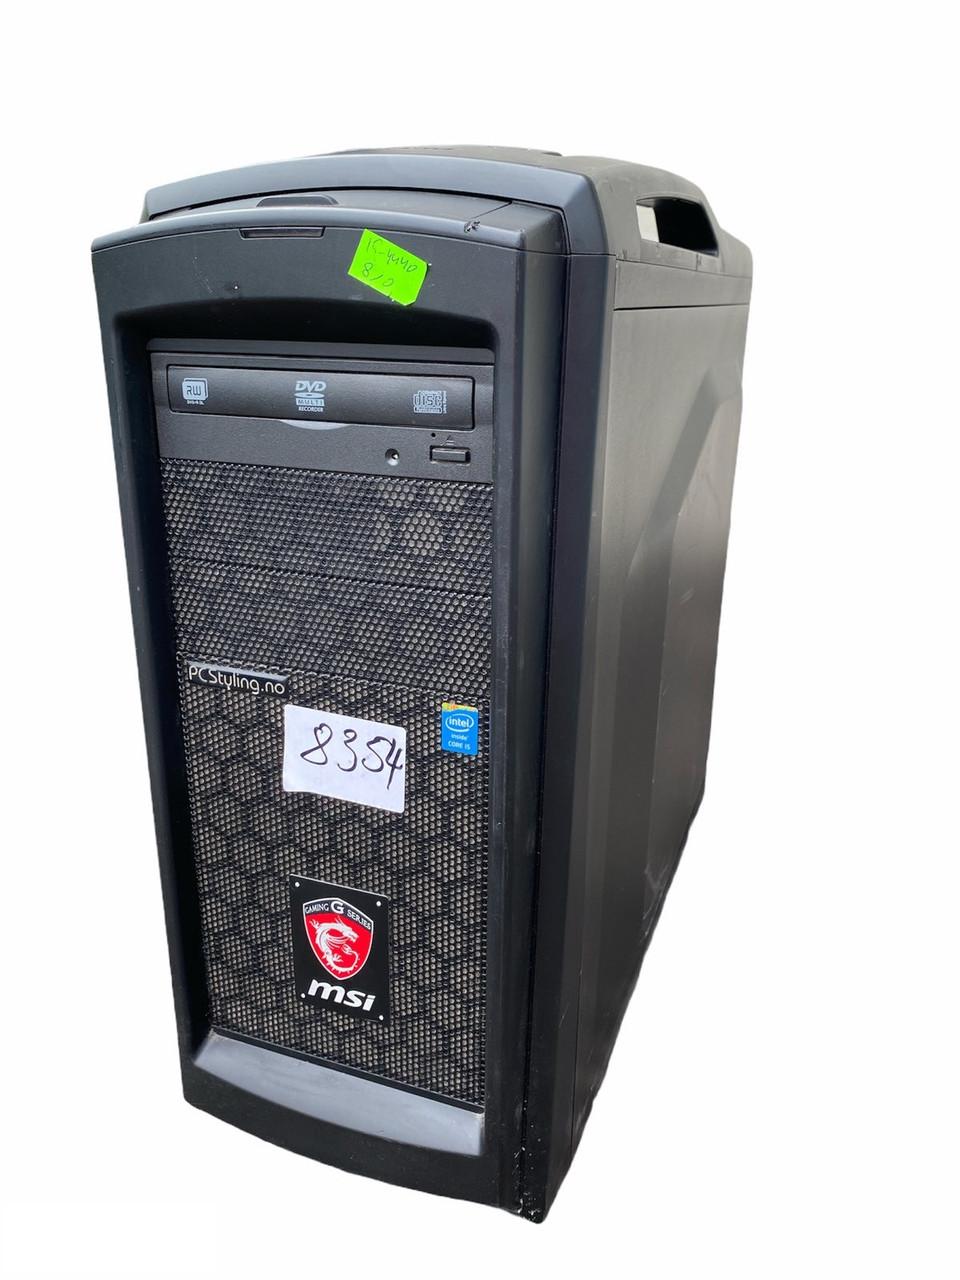 Системний блок-Mini-Tower-Asus Z97-Intel Core i5-4440-3.1GHz-8Gb-DDR3-HDD-500Gb-(B)- Б/В